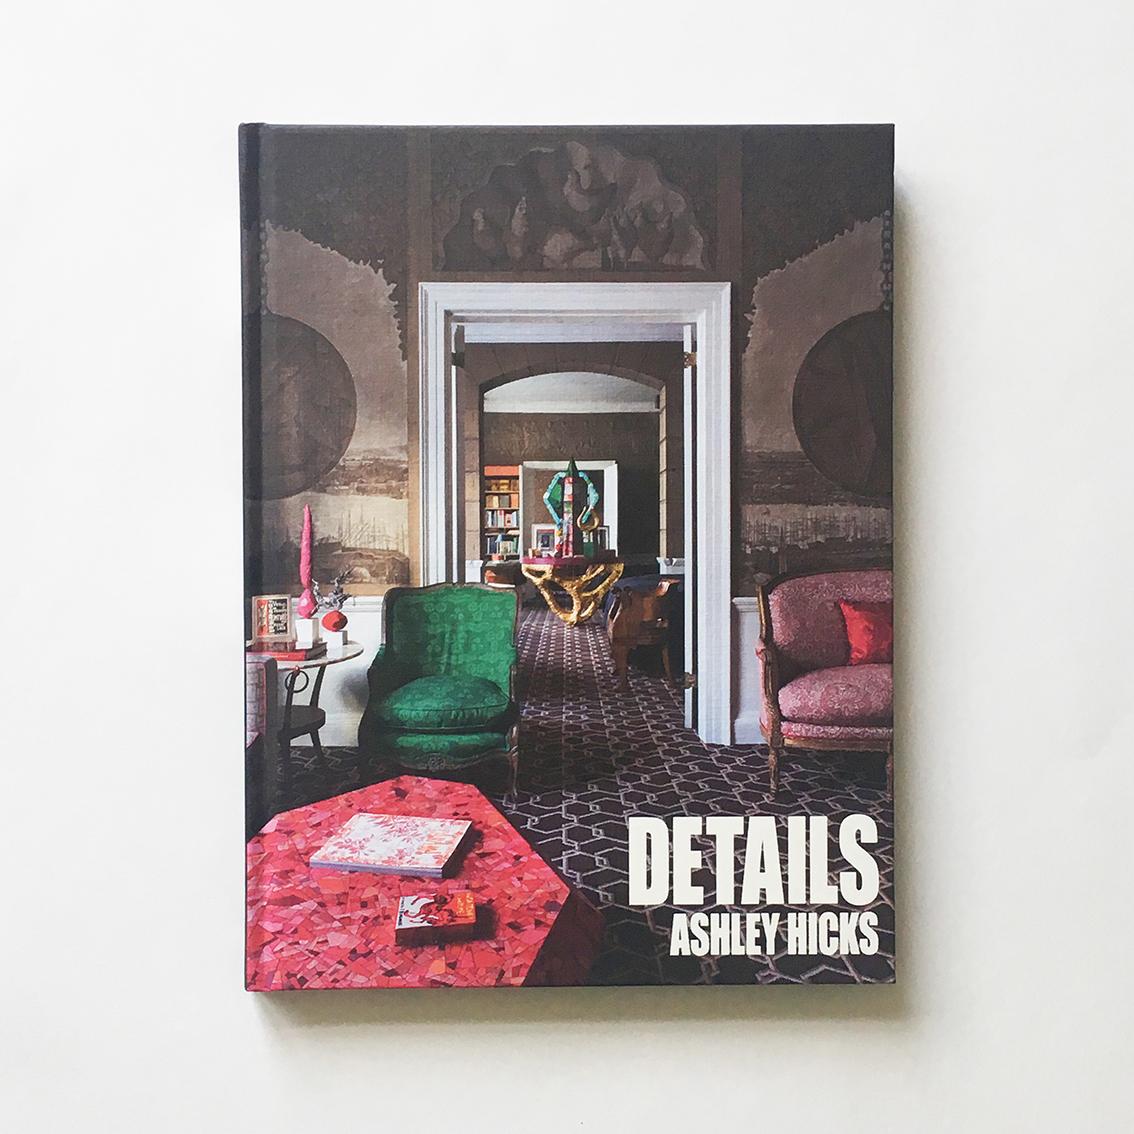 Ashley_Hicks_Details_Book_1.jpg